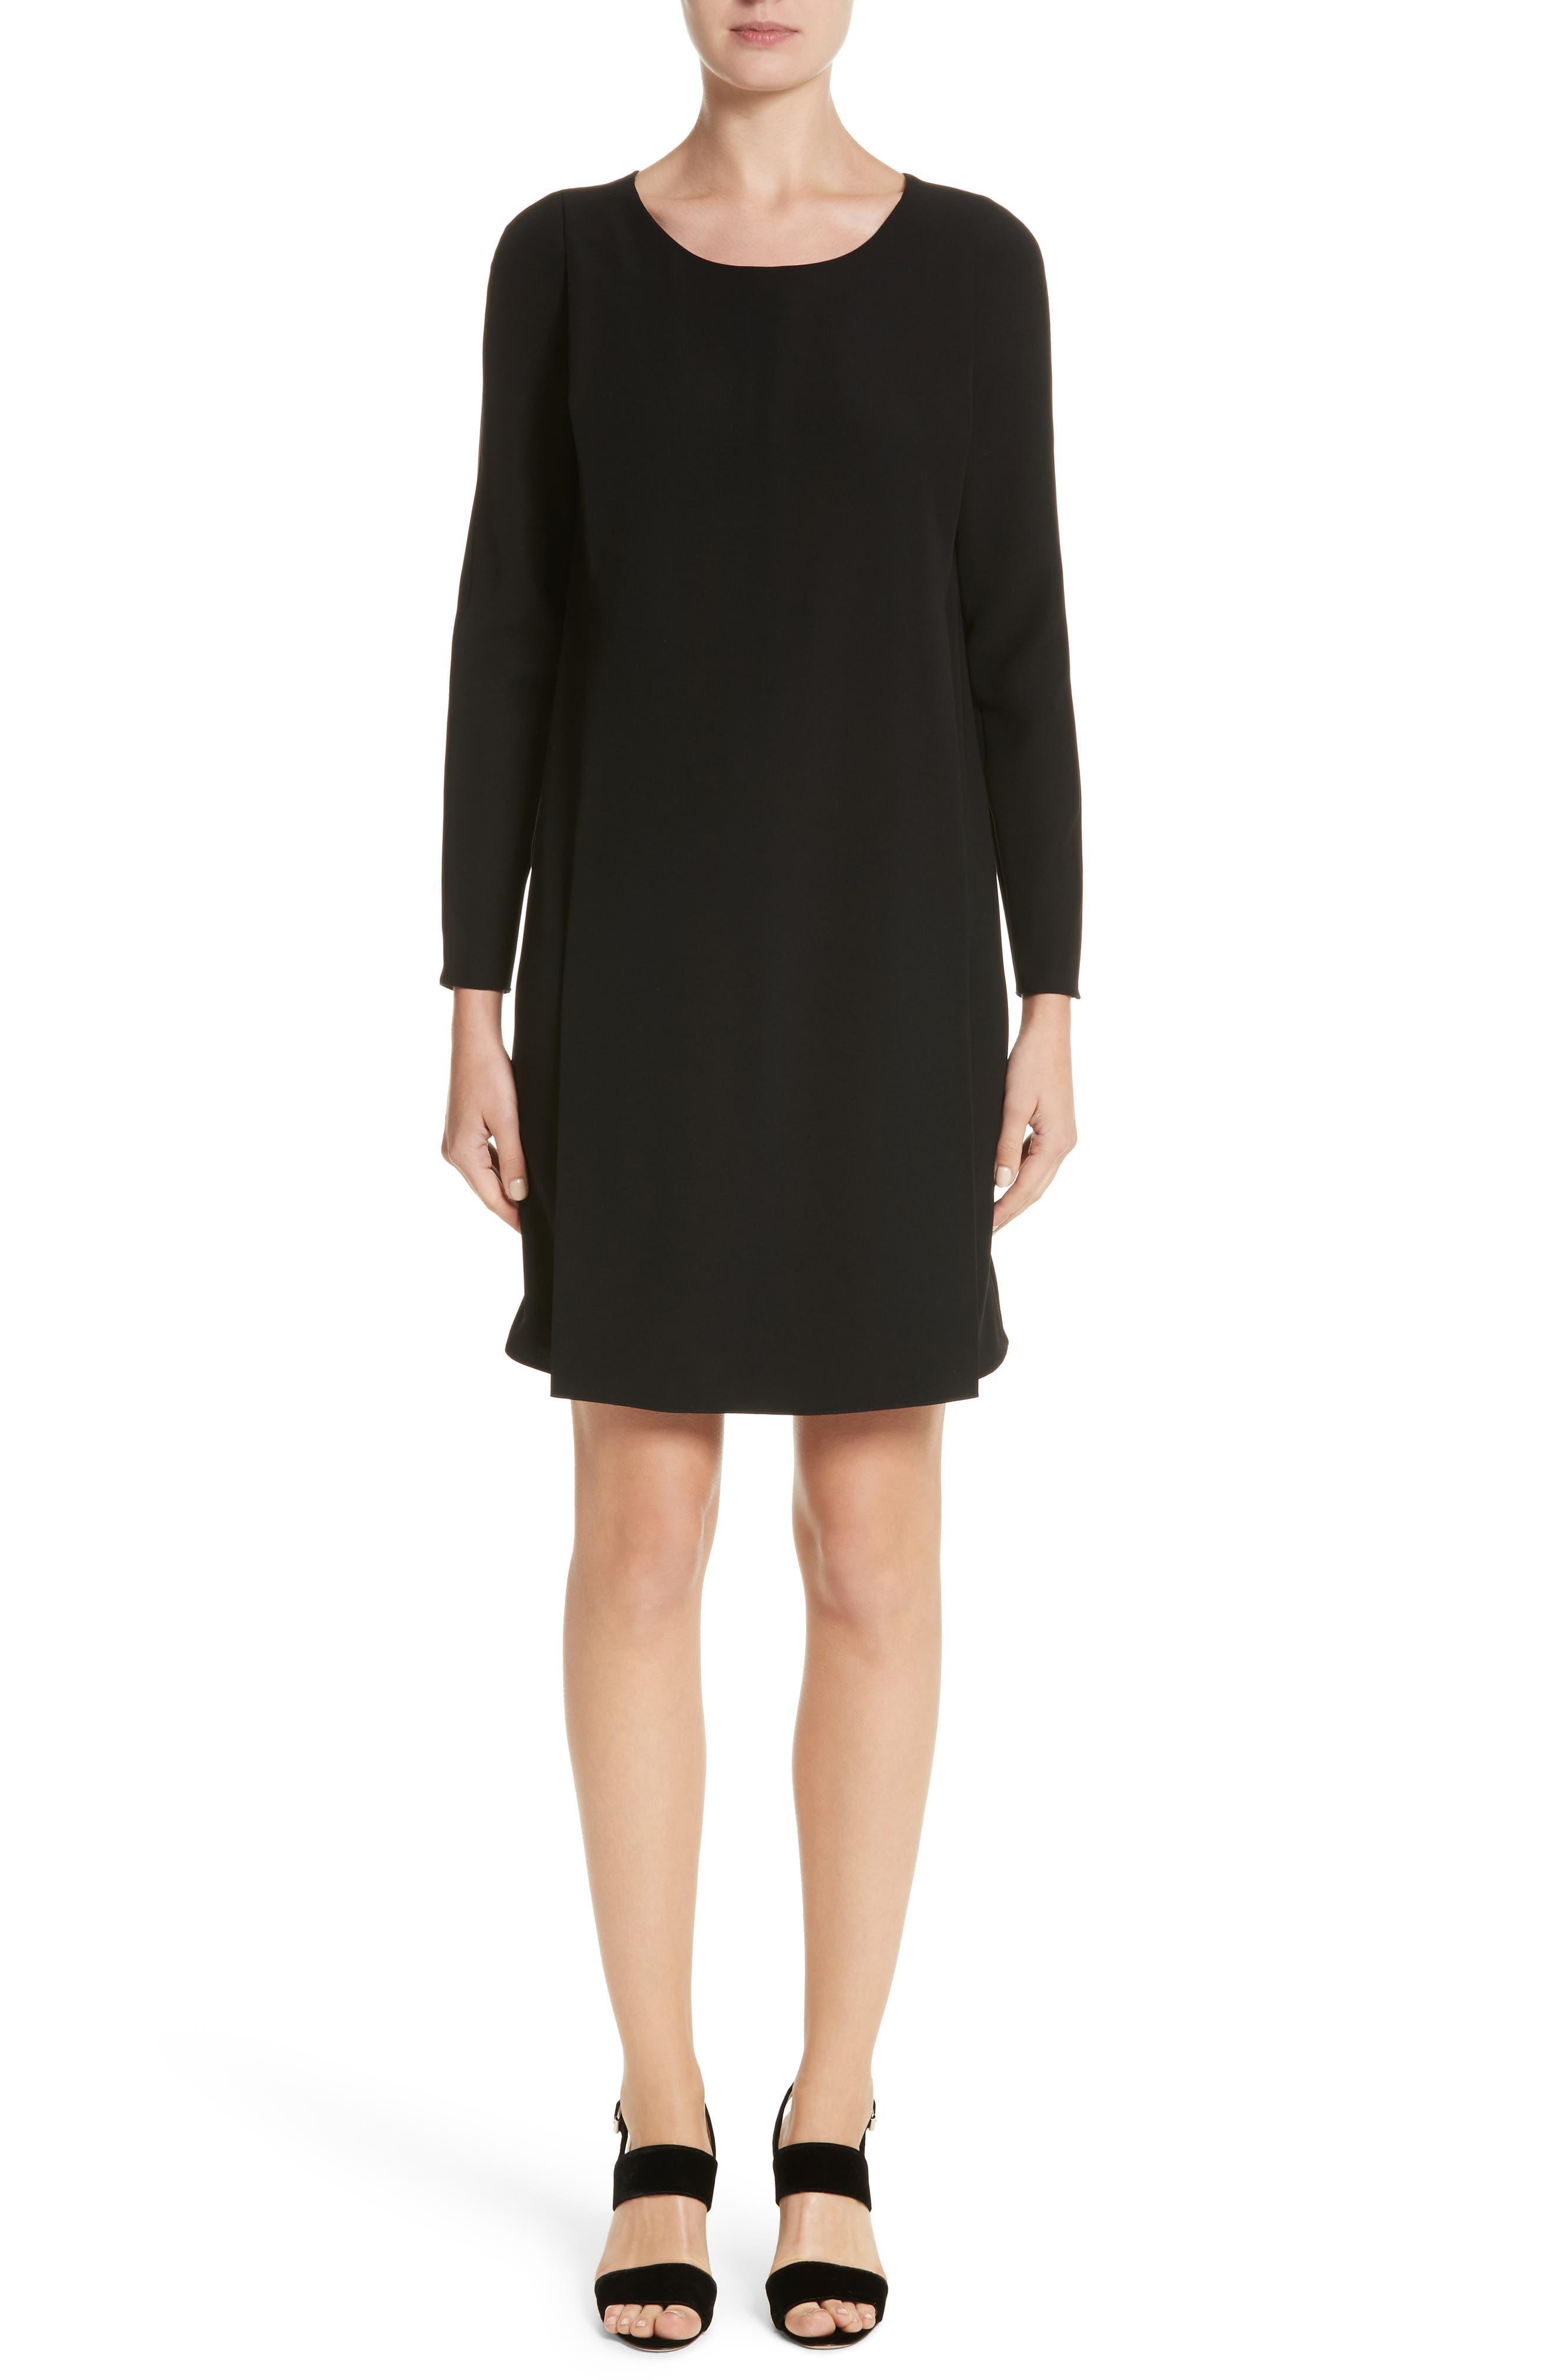 EMPORIO ARMANI Draped Cady Shift Dress, Main, color, 004